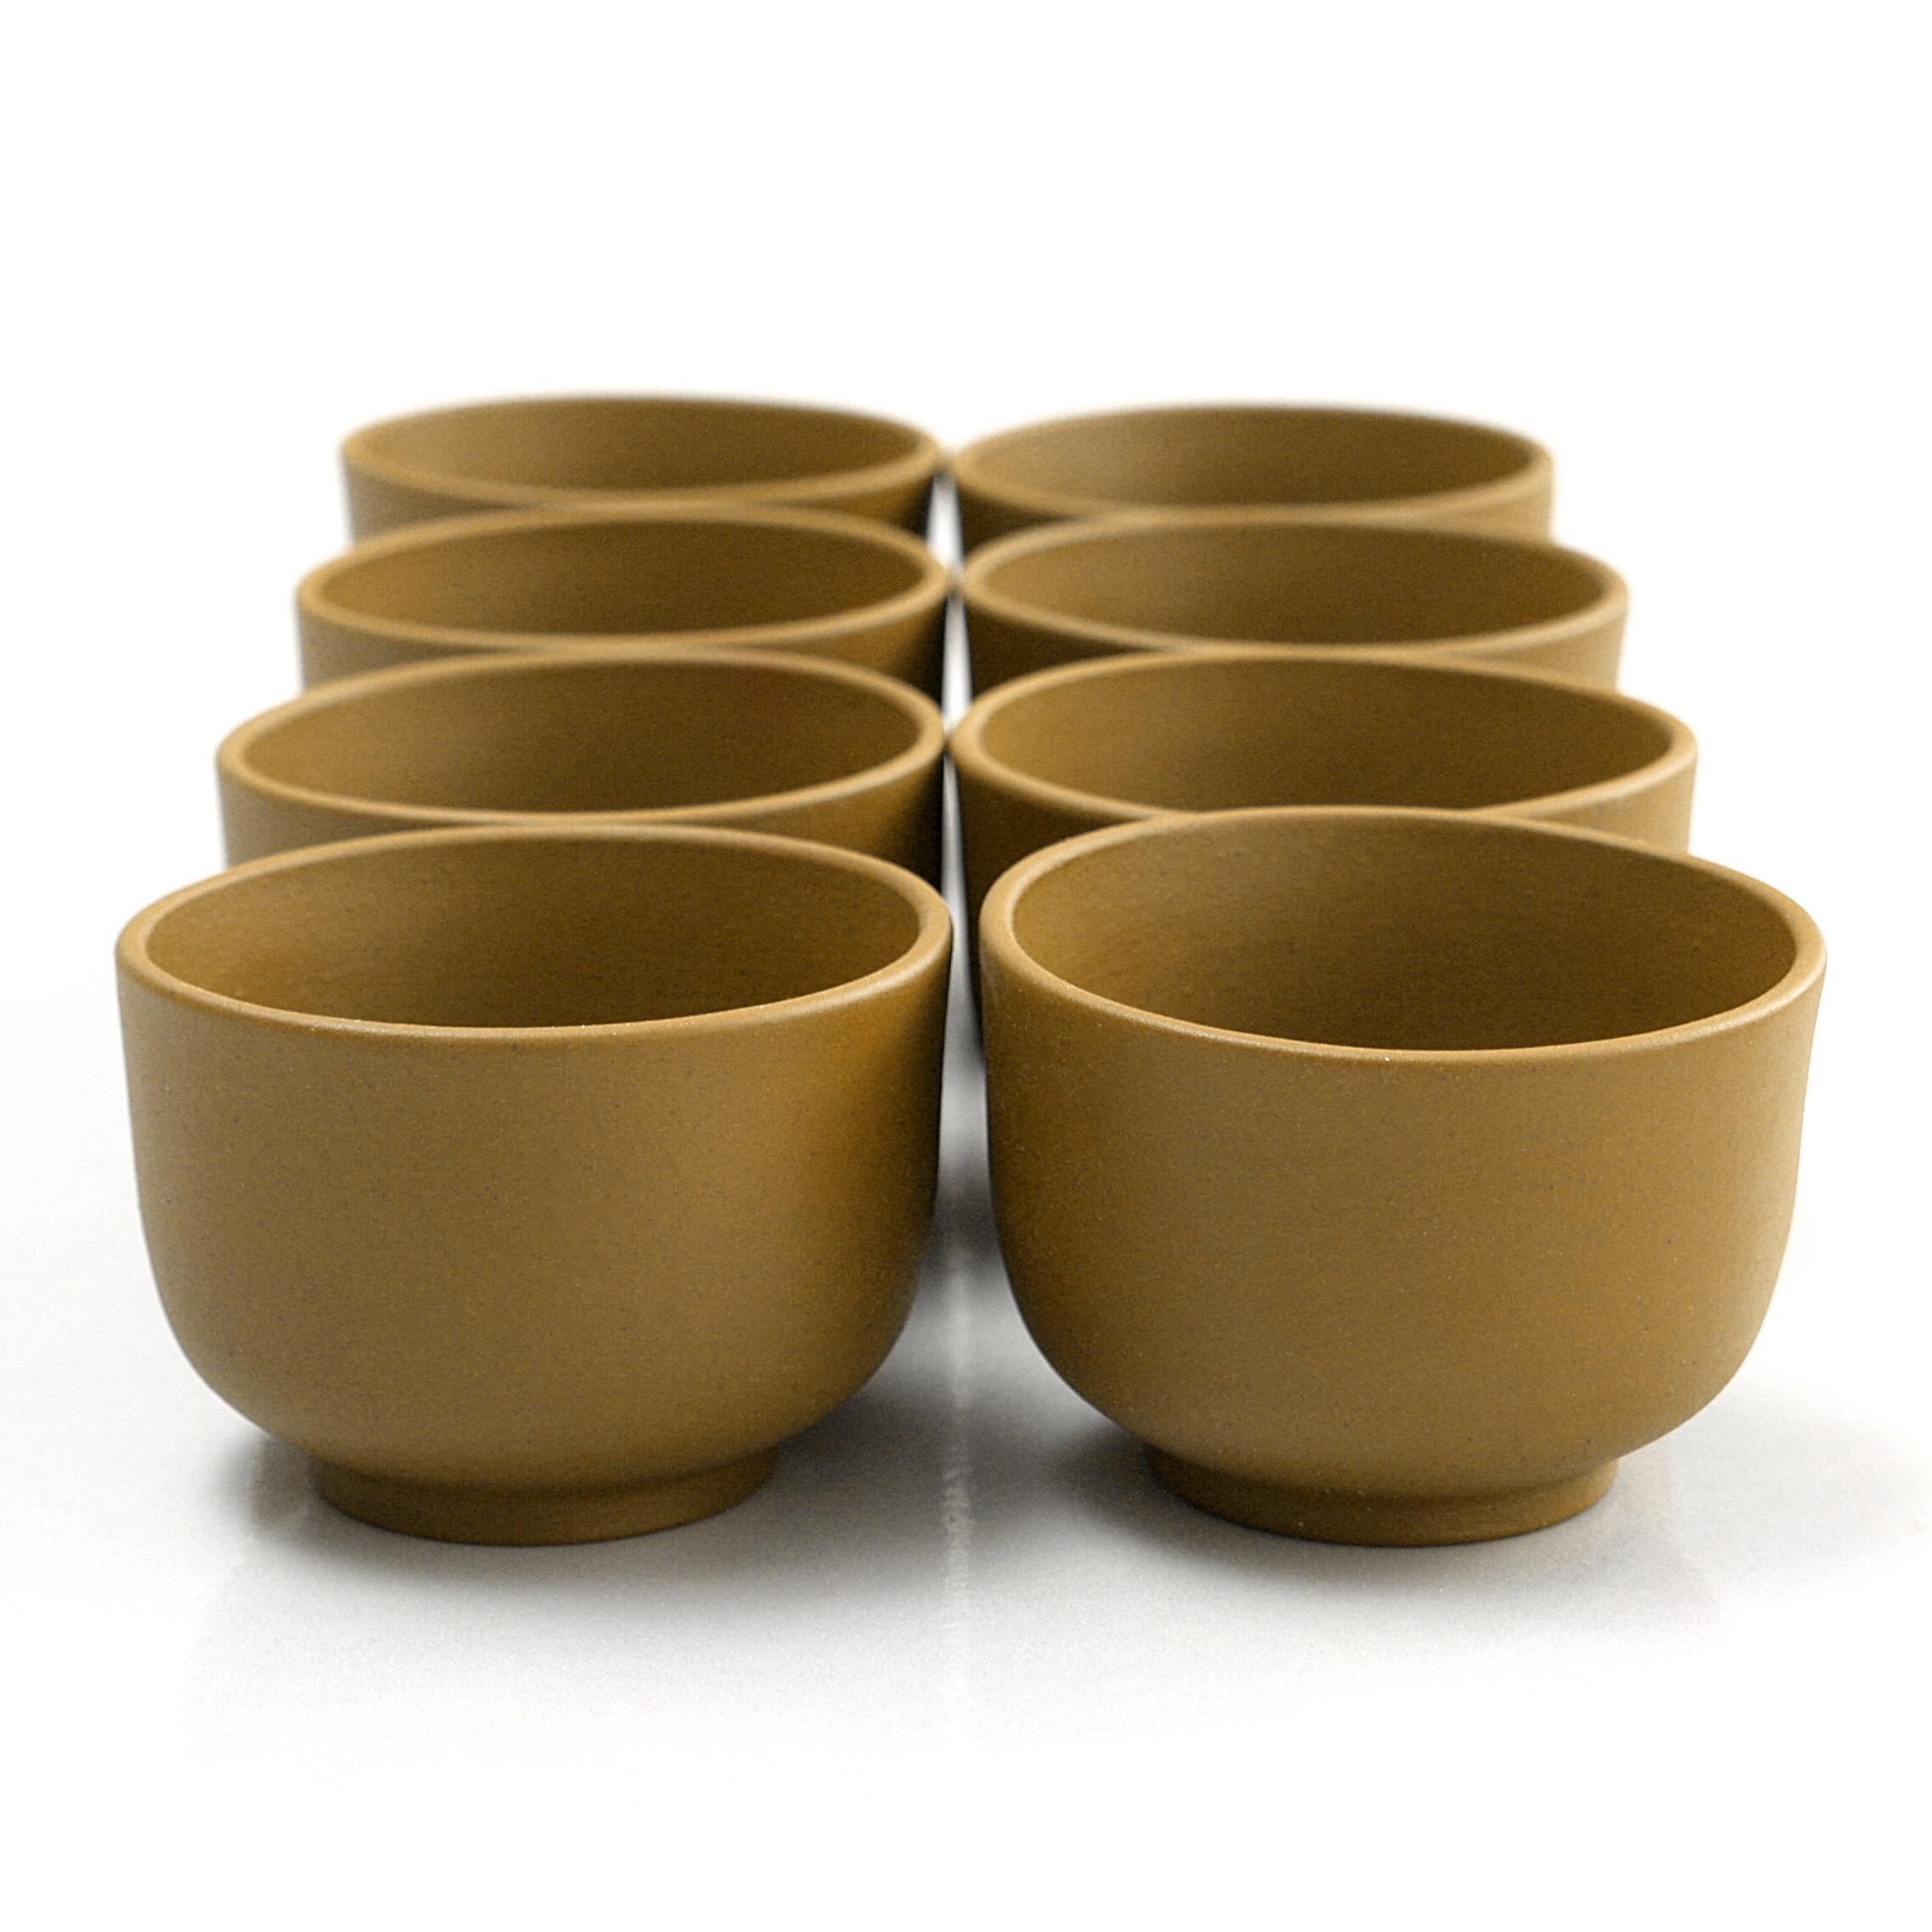 Dark Mustard Yixing 3 Ounce Teacup, Set of 8